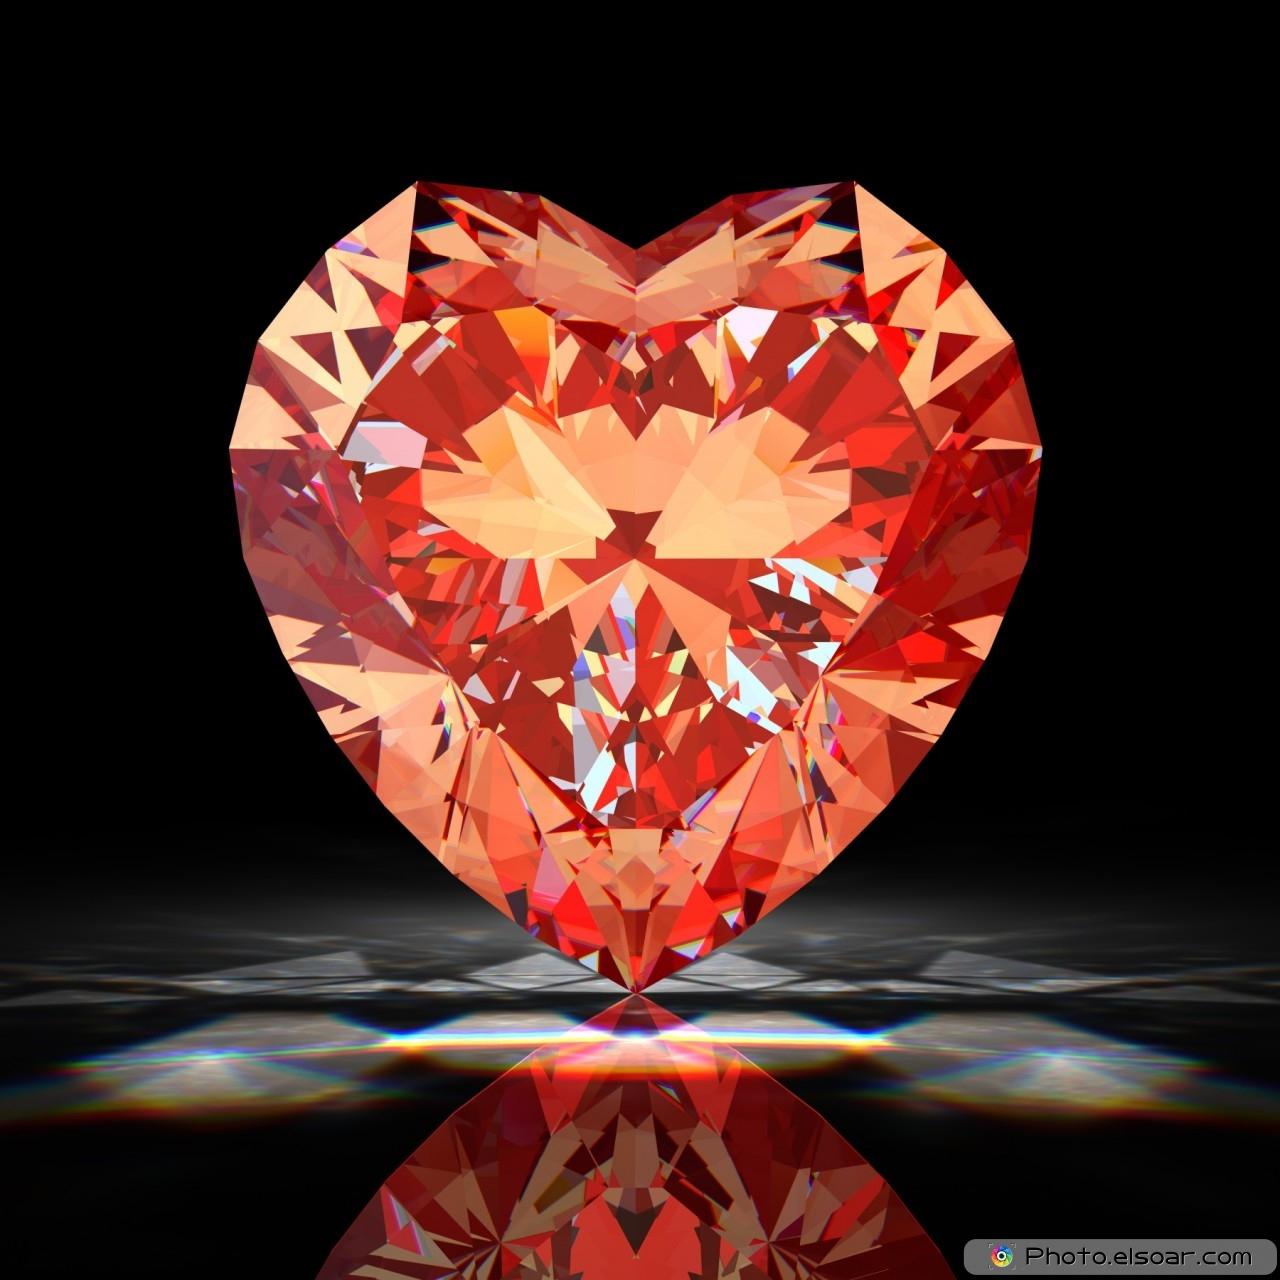 Red diamond heart